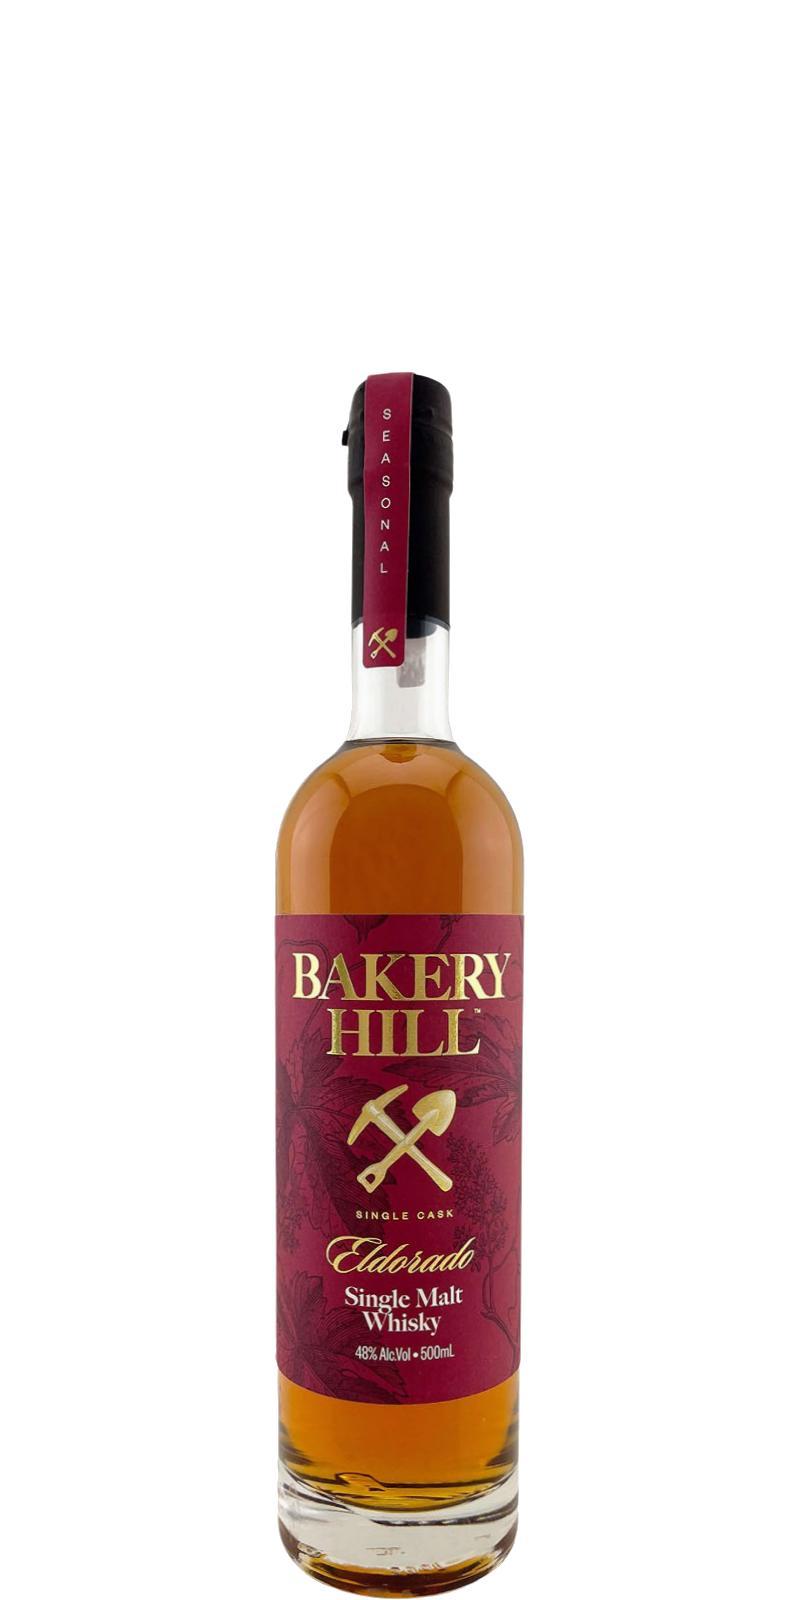 Bakery Hill 2015